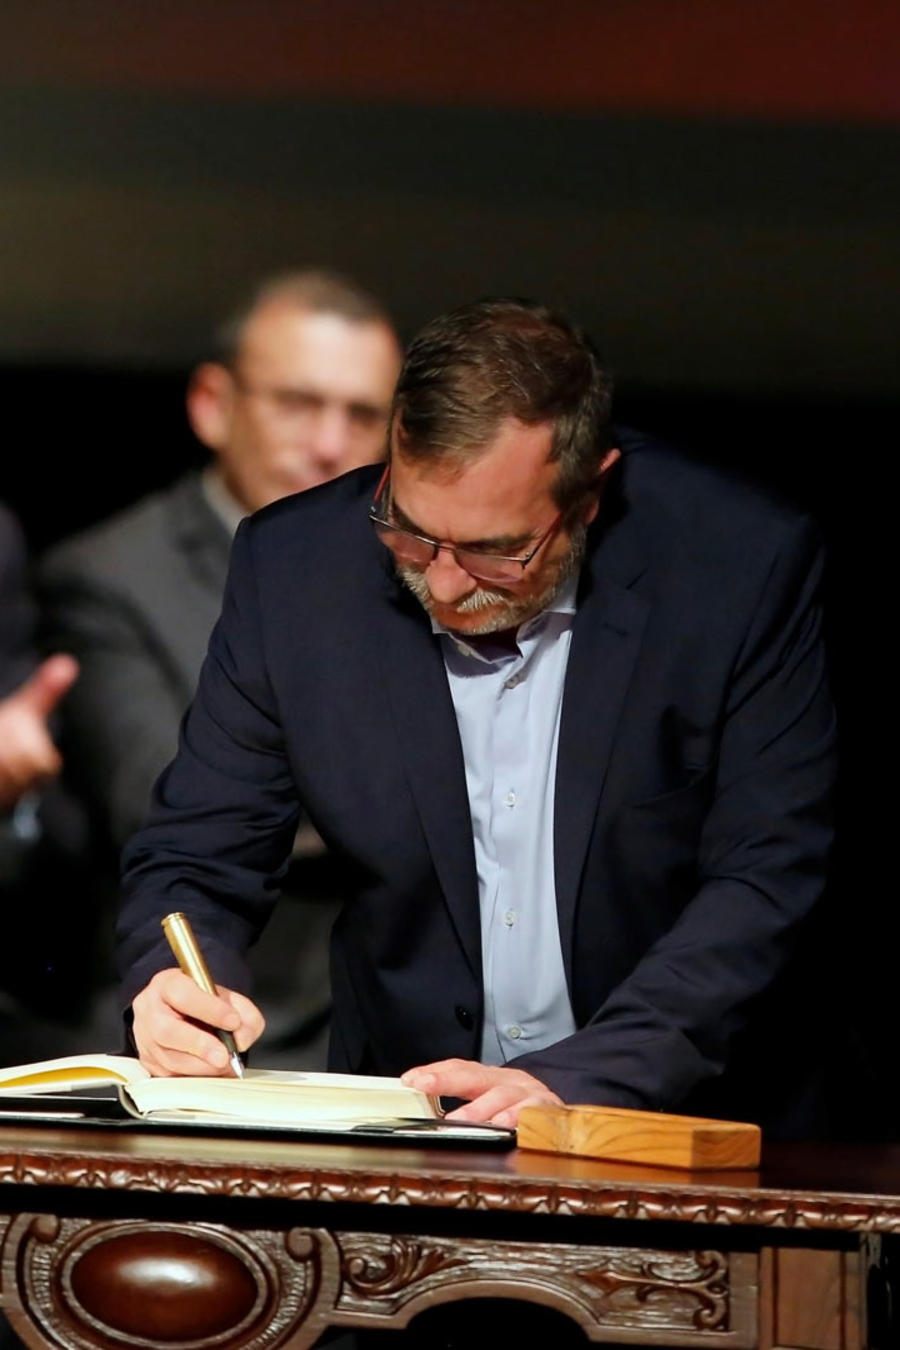 colombia firma segundo acuerdo de paz